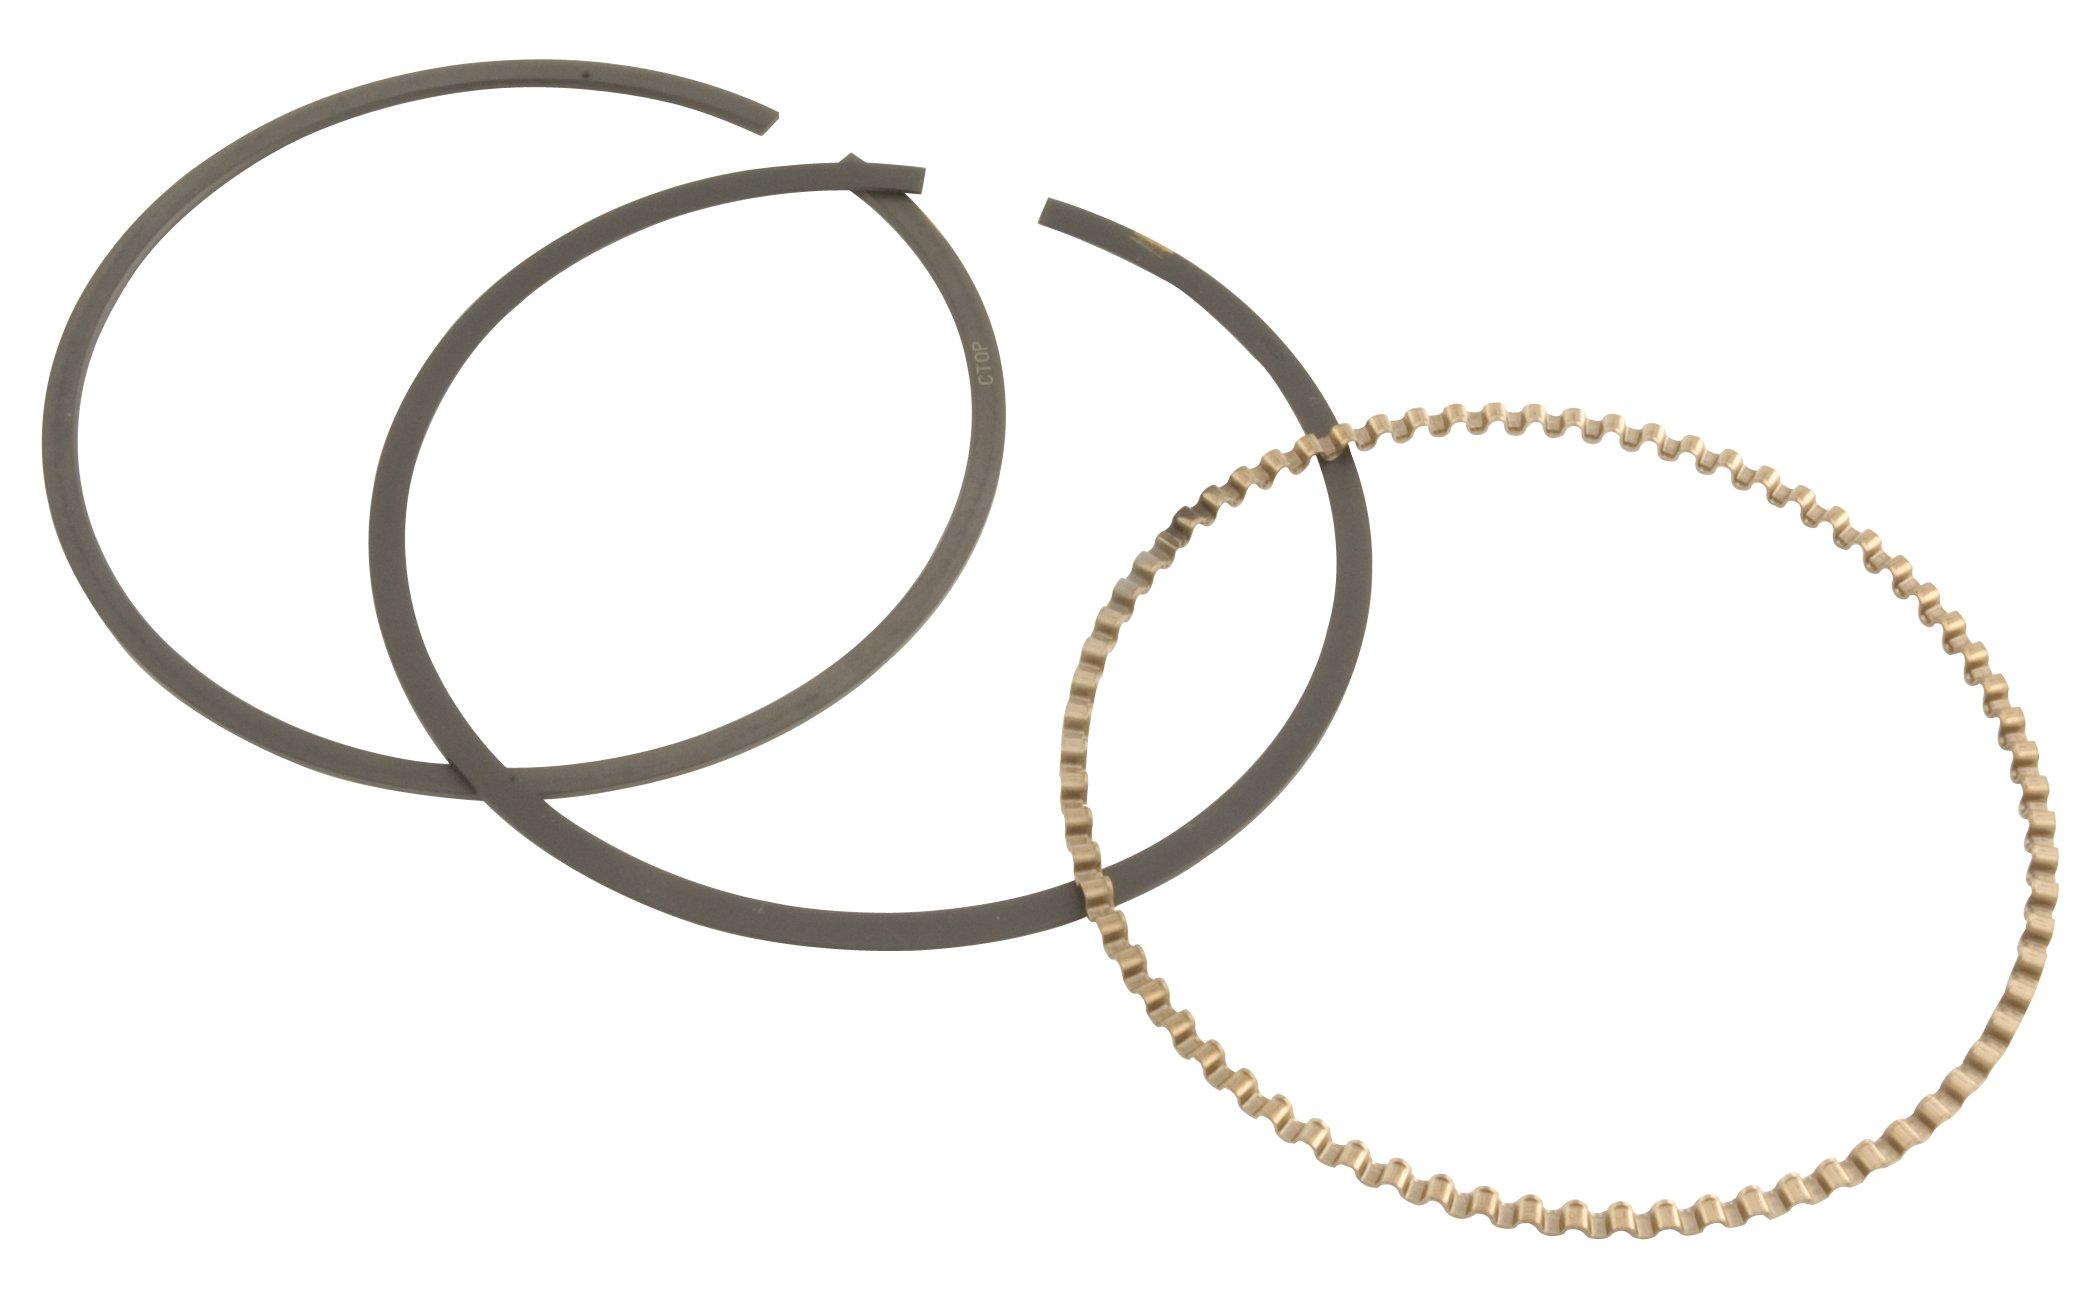 Mahle Motorsports 4035ML-043 4.035'' Bore .043 - .043 - 3.0mm Piston Ring Set by Mahle